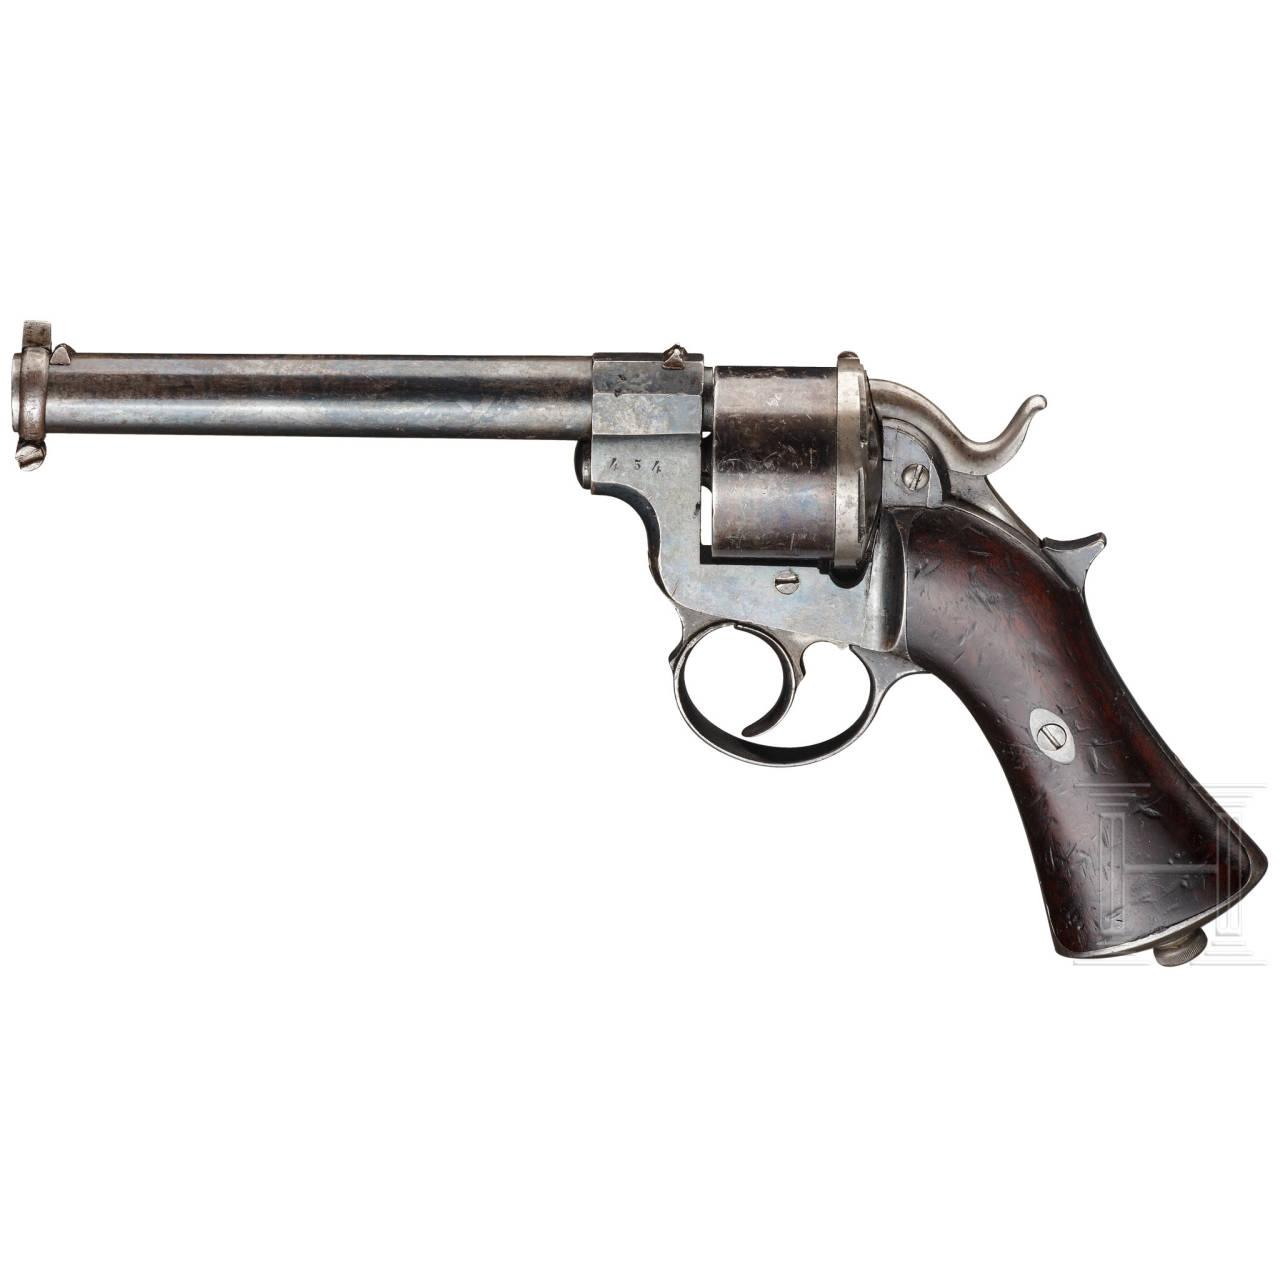 Revolver Raphael, US-Bürgerkrieg